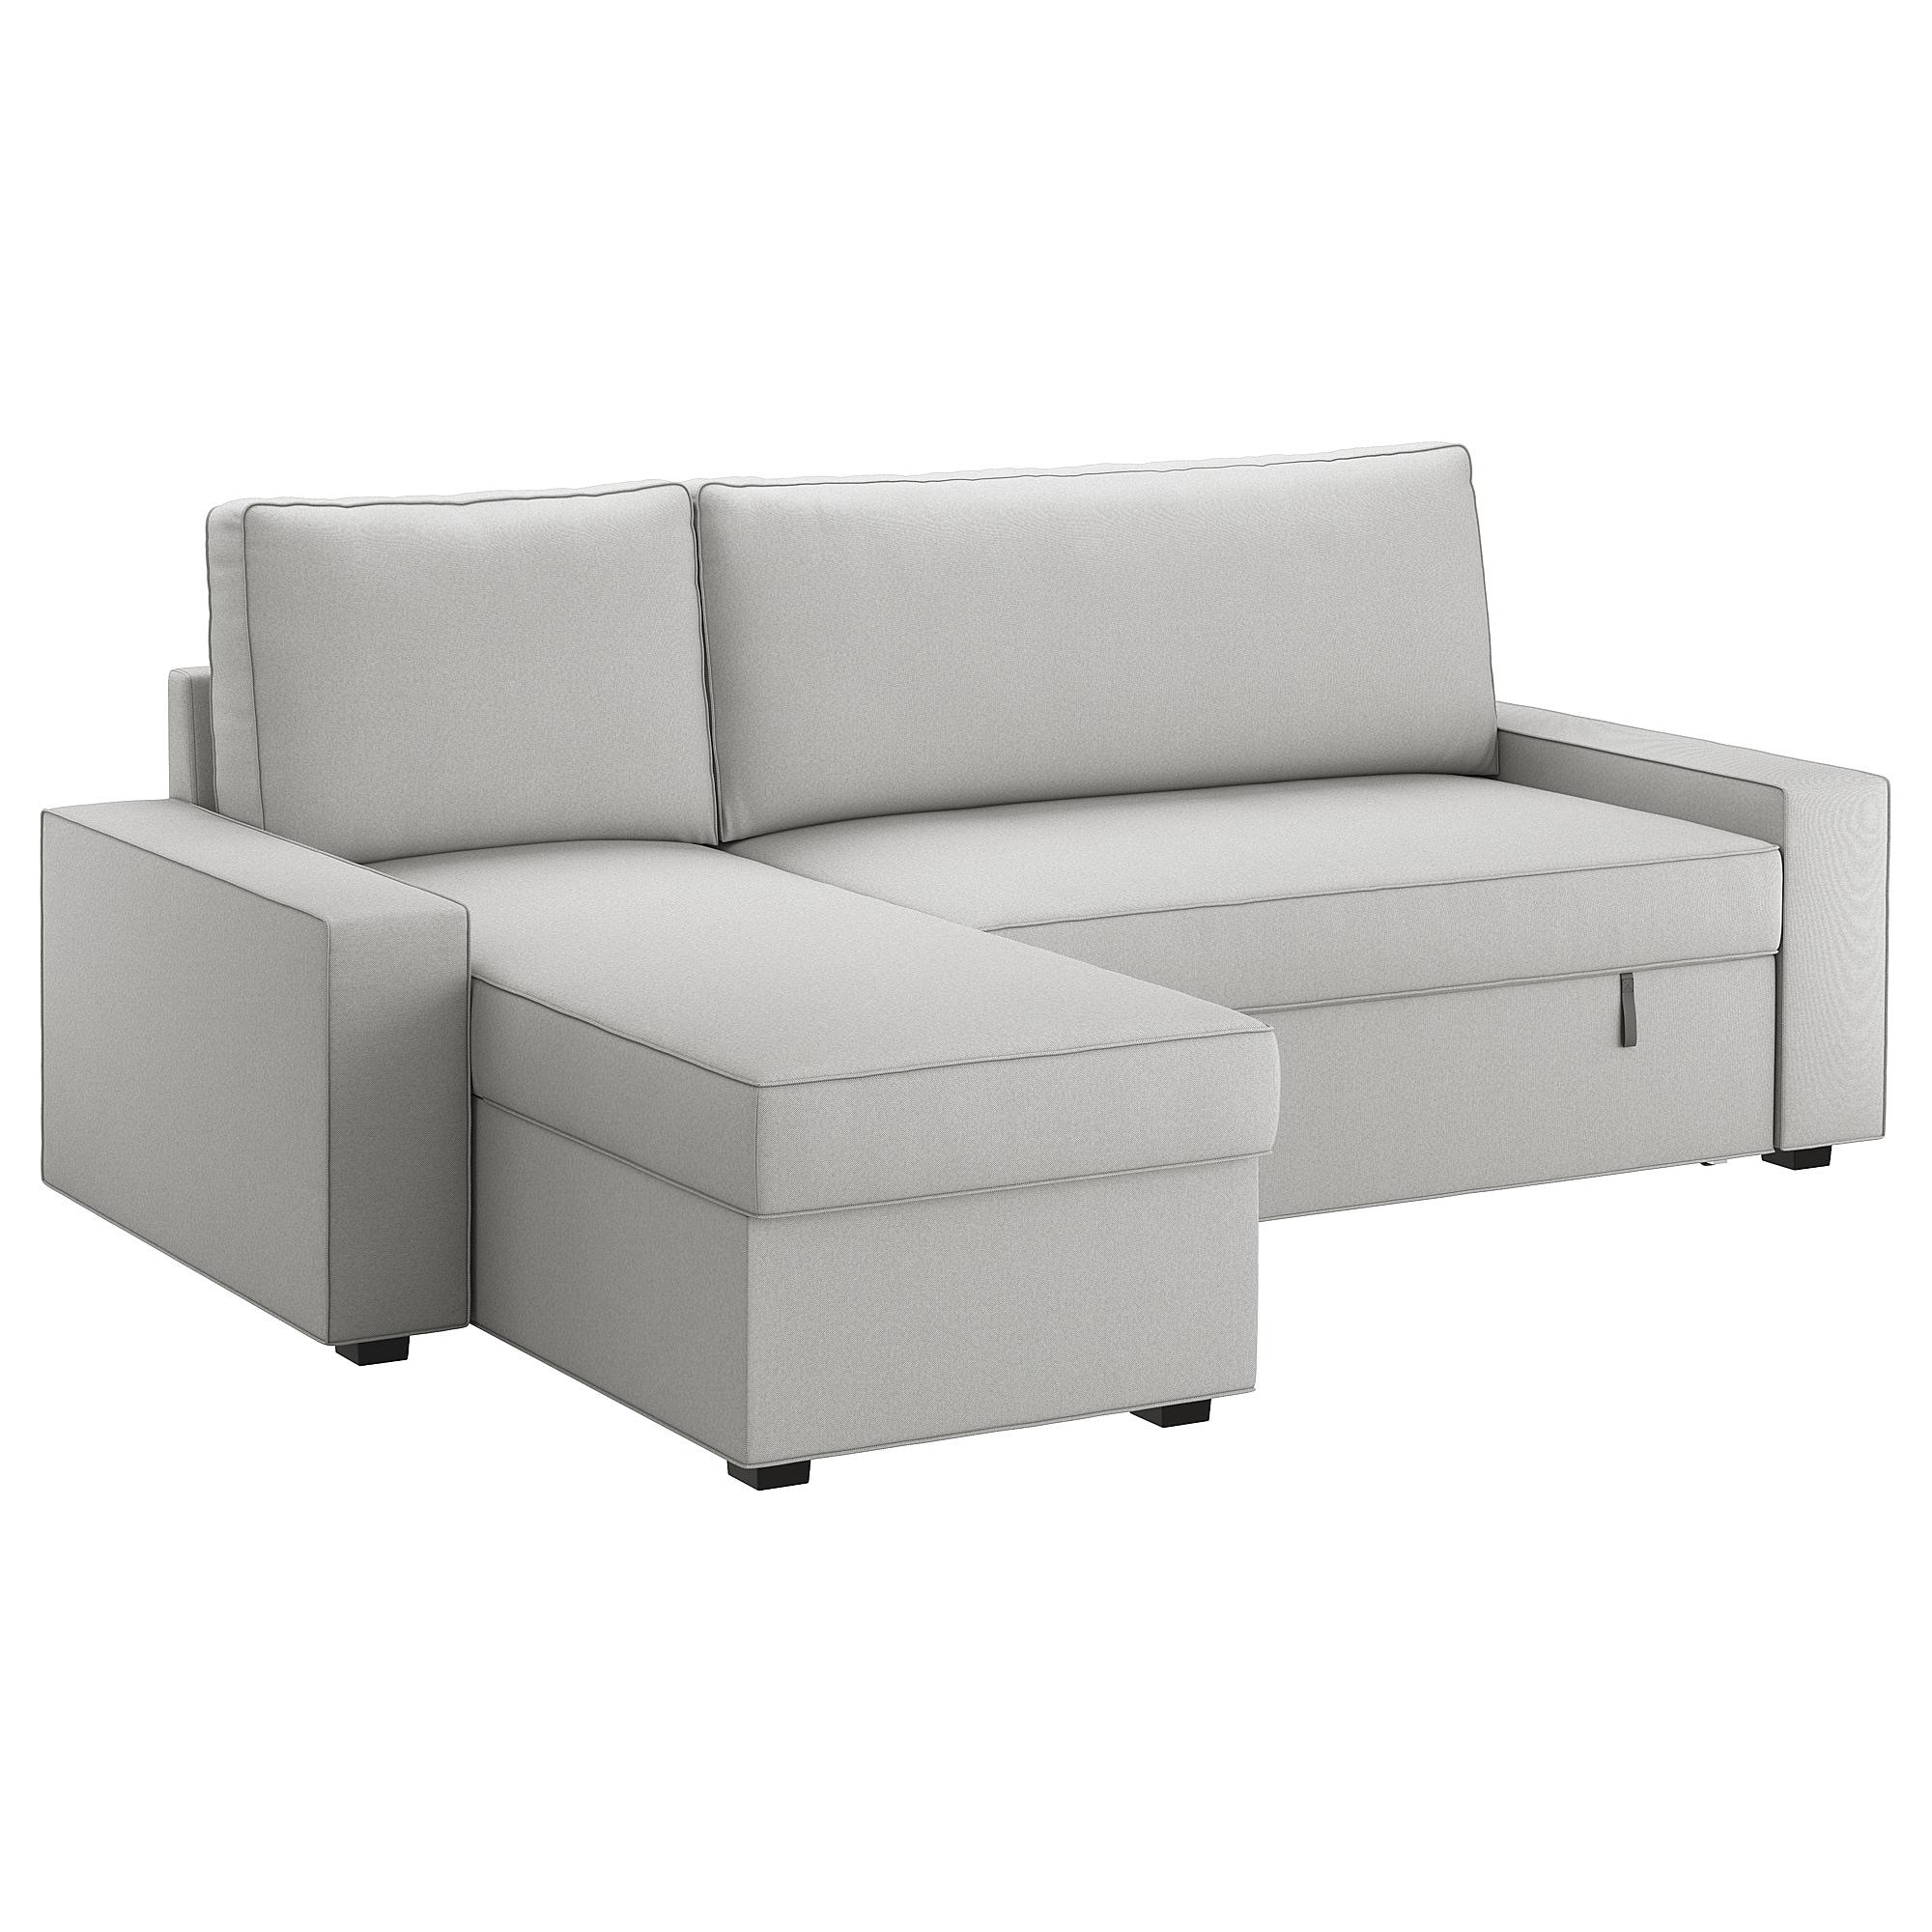 Sofa Cama Con Chaise Longue Zwd9 Vilasund sofà Cama Con Chaiselongue orrsta Gris Claro Ikea